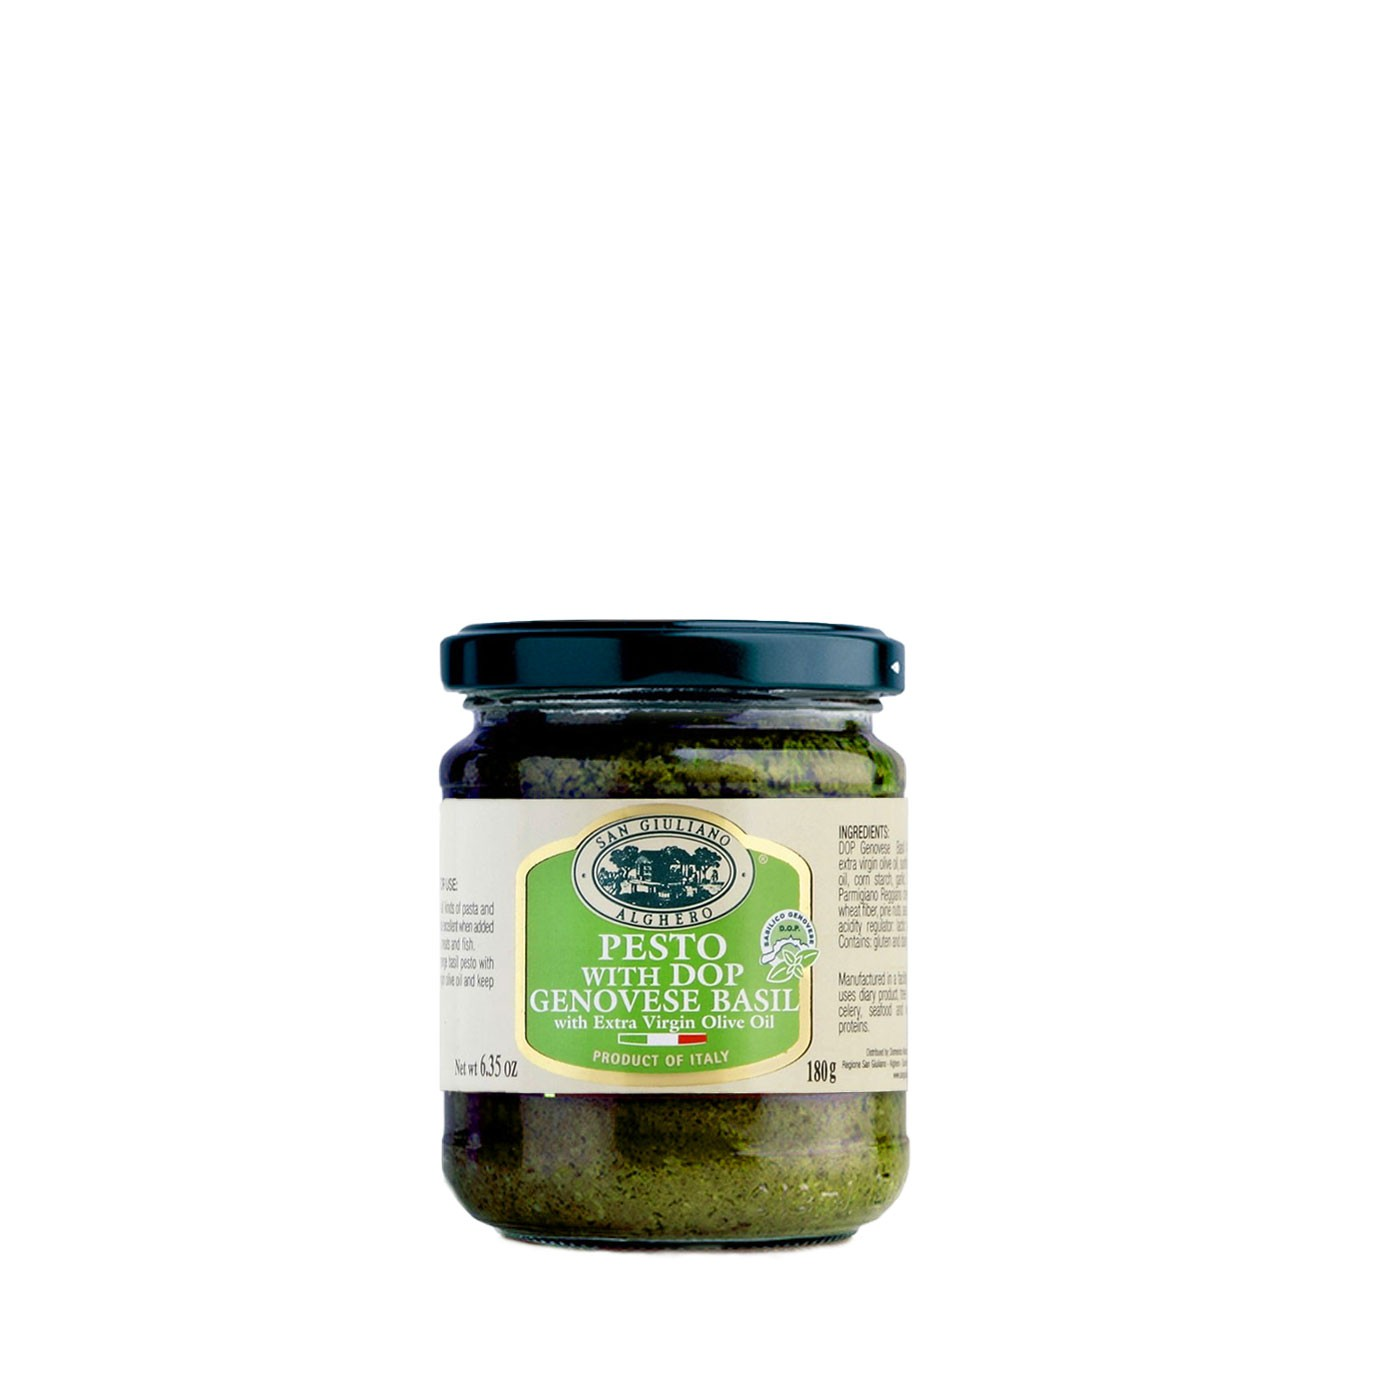 Pesto with DOP Genovese Basil 6.3 oz - San Giuliano | Eataly.com